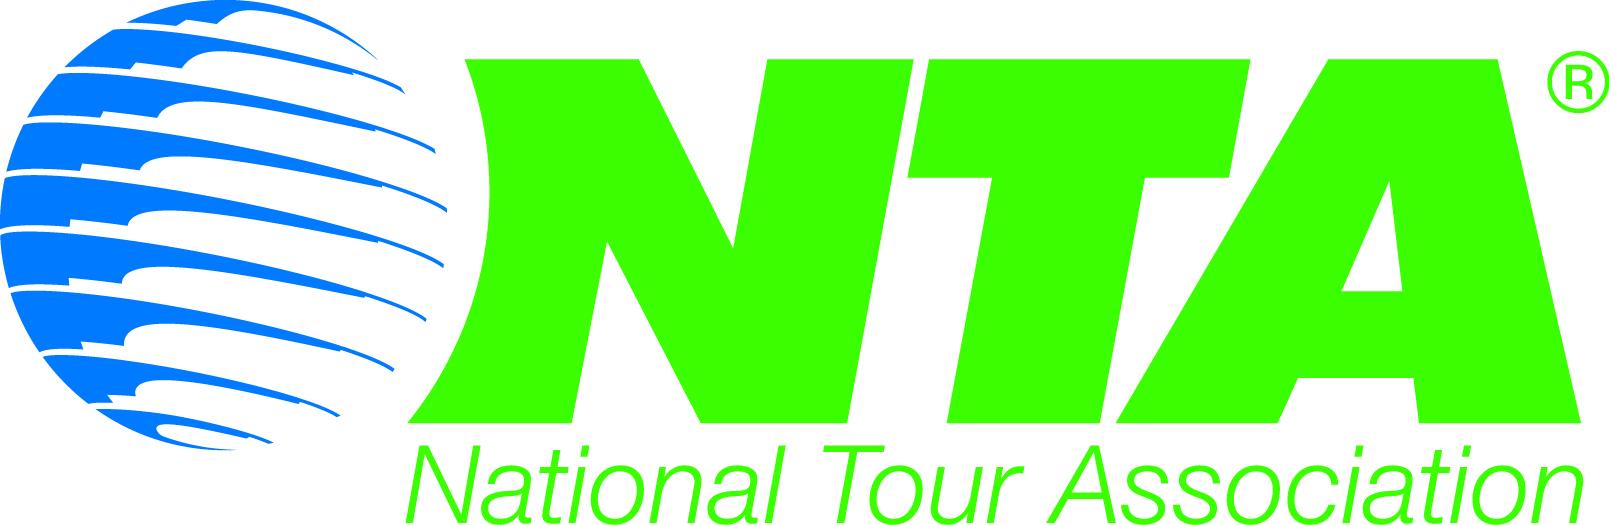 NTA 2016-Natl Tour Assoc HighRes.jpg